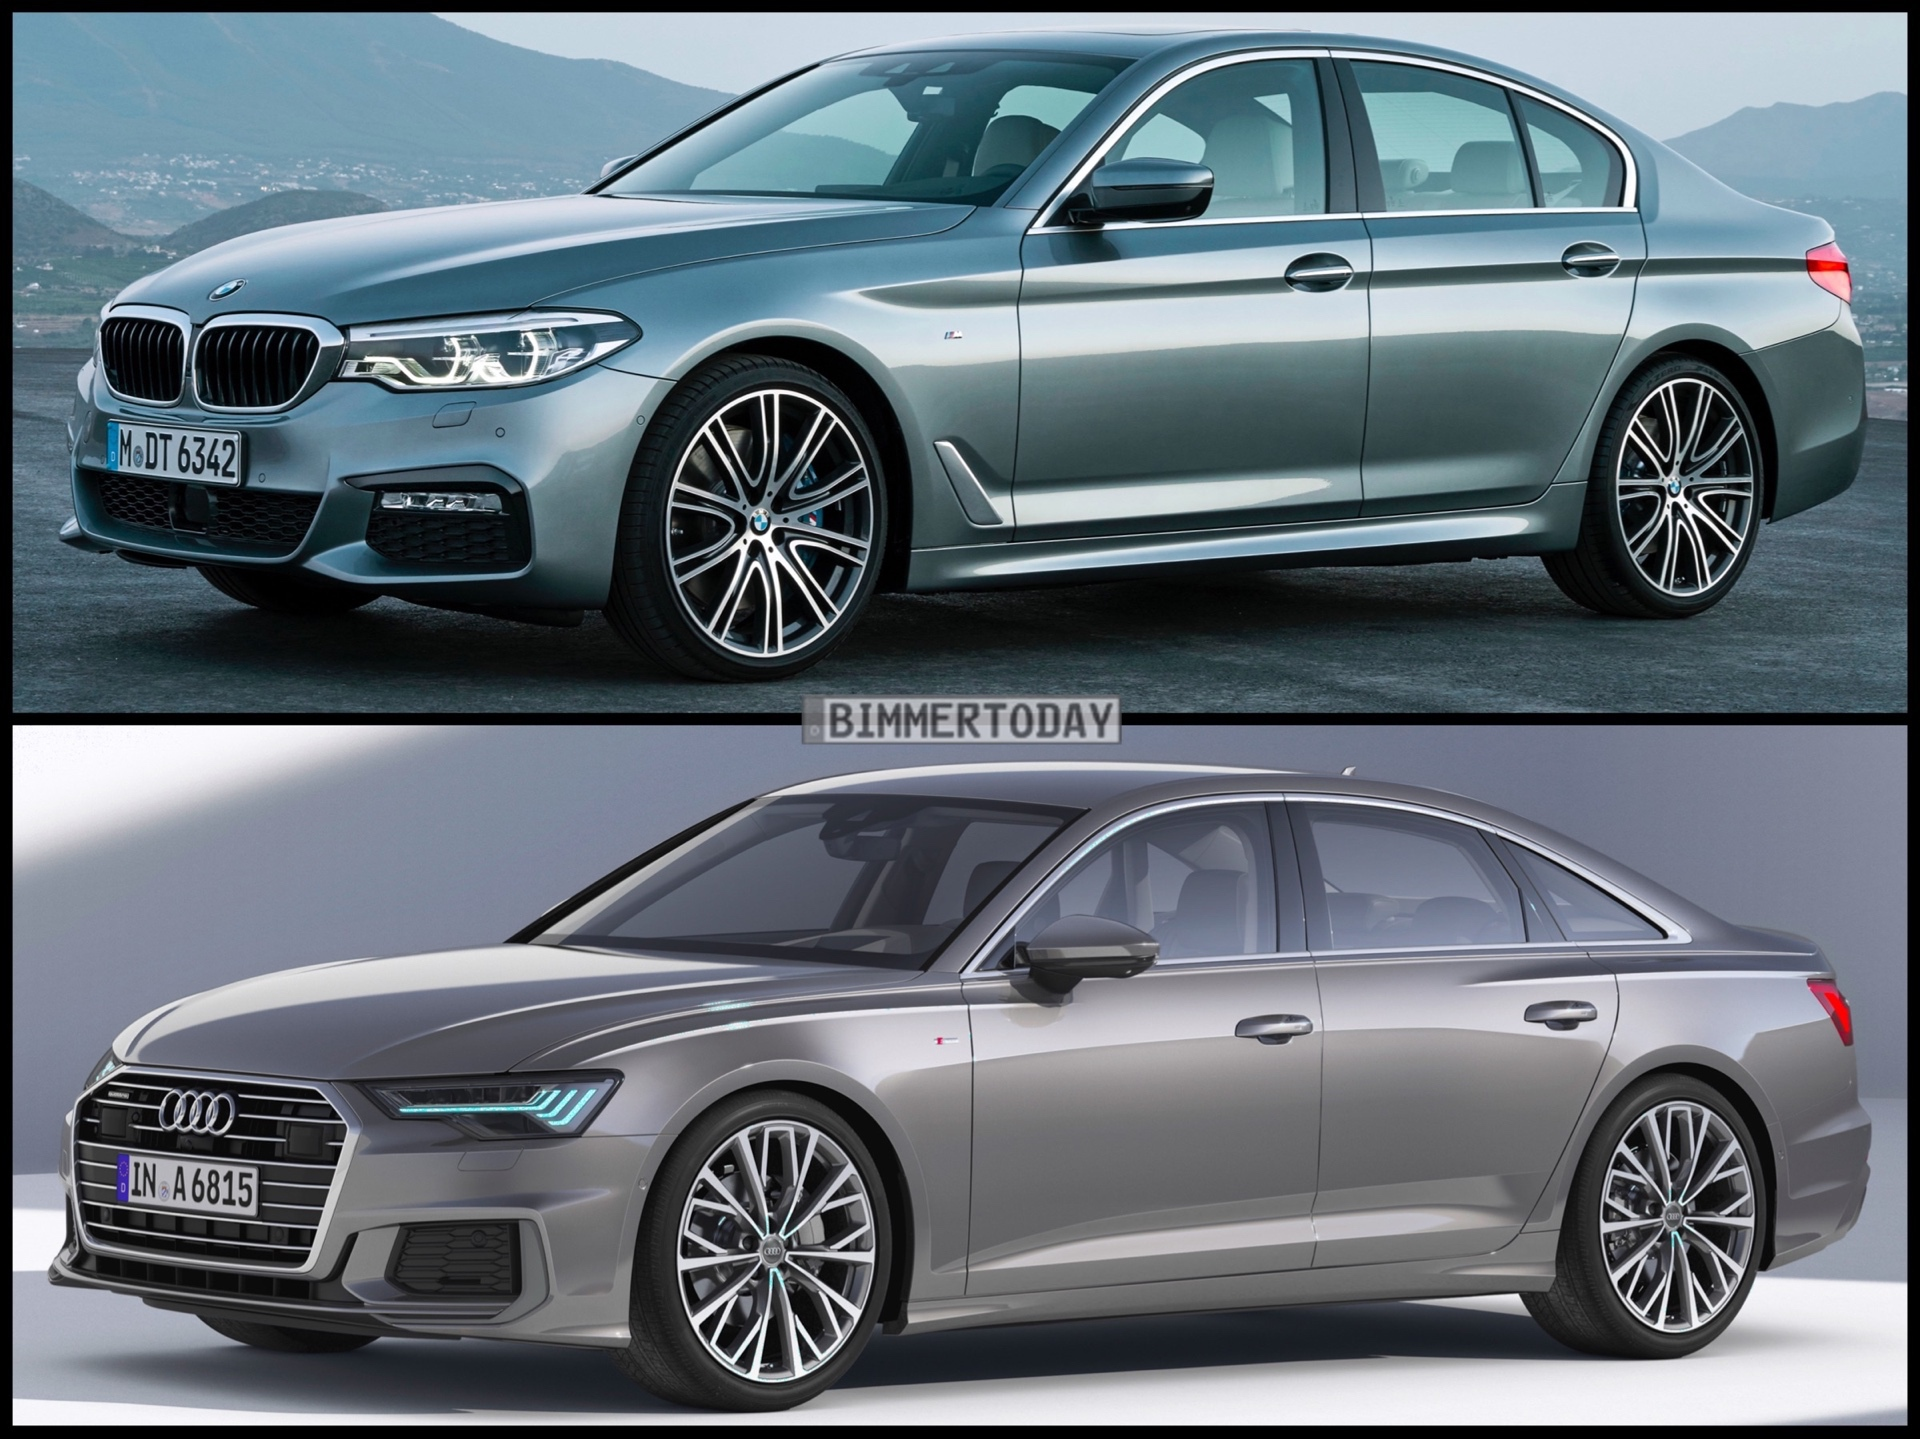 Image Comparison New Audi A6 Vs Bmw G30 5 Series